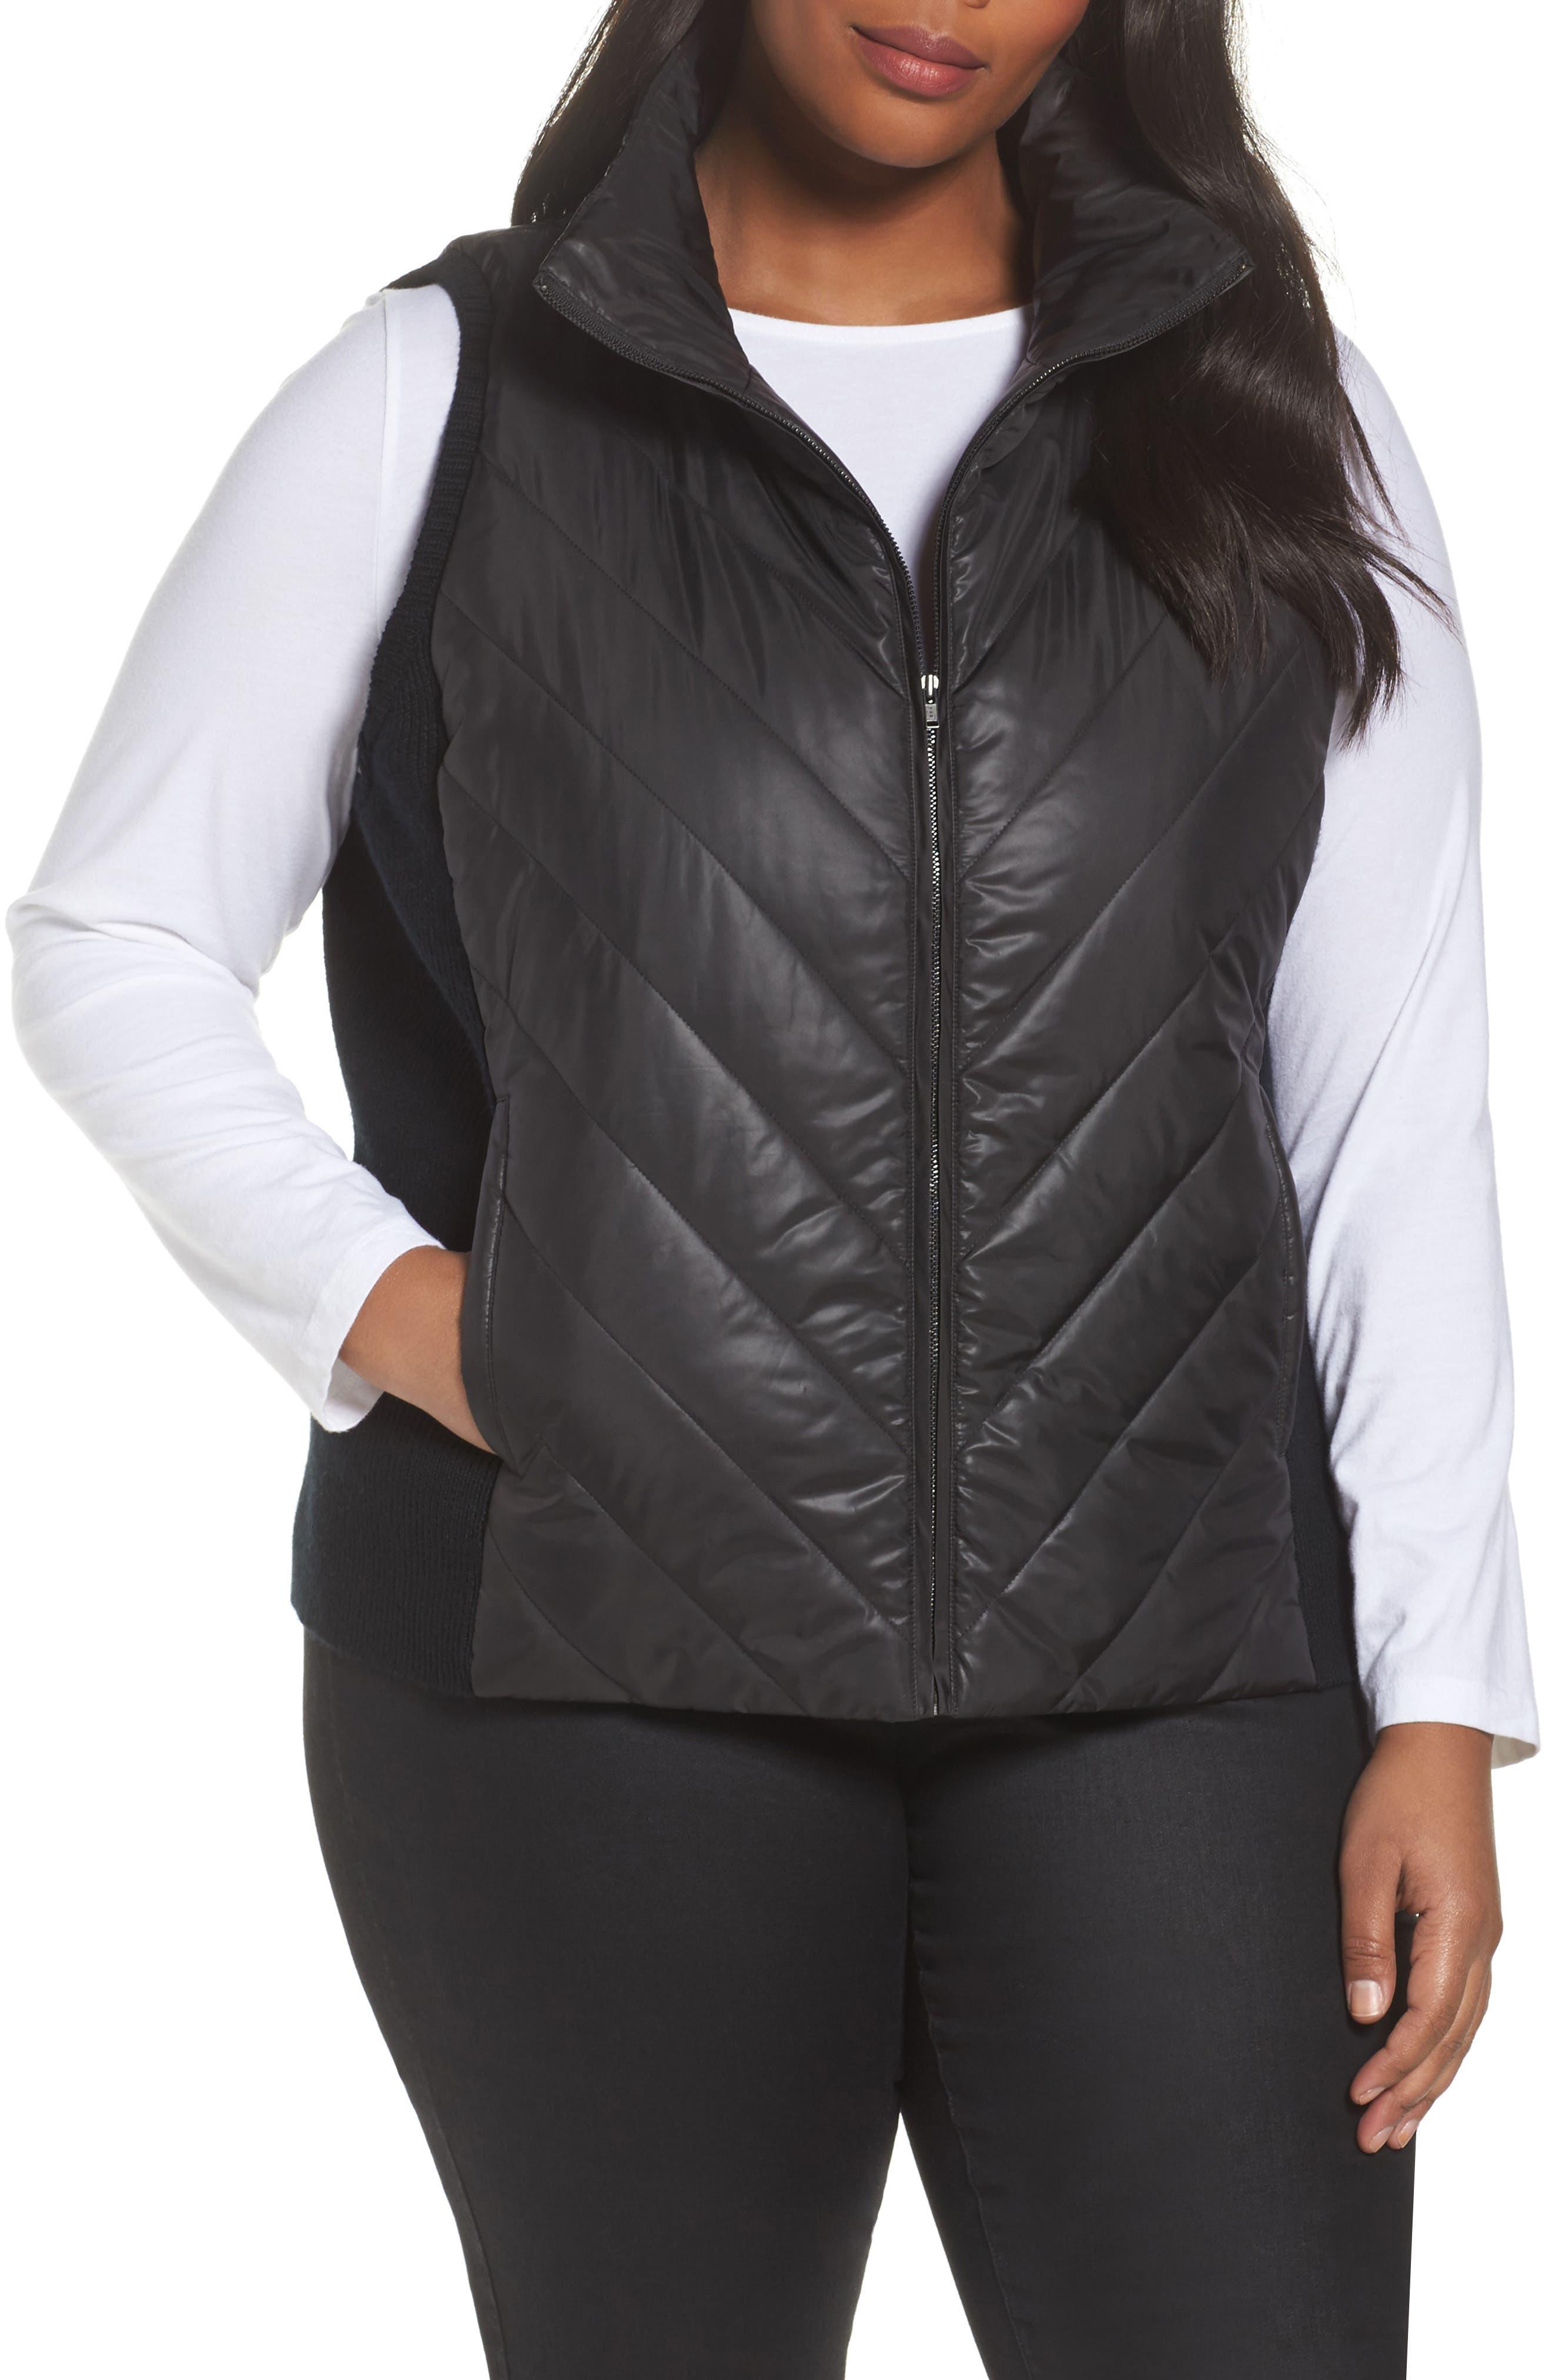 Merino Wool Trim Puffer Vest,                             Main thumbnail 1, color,                             Black